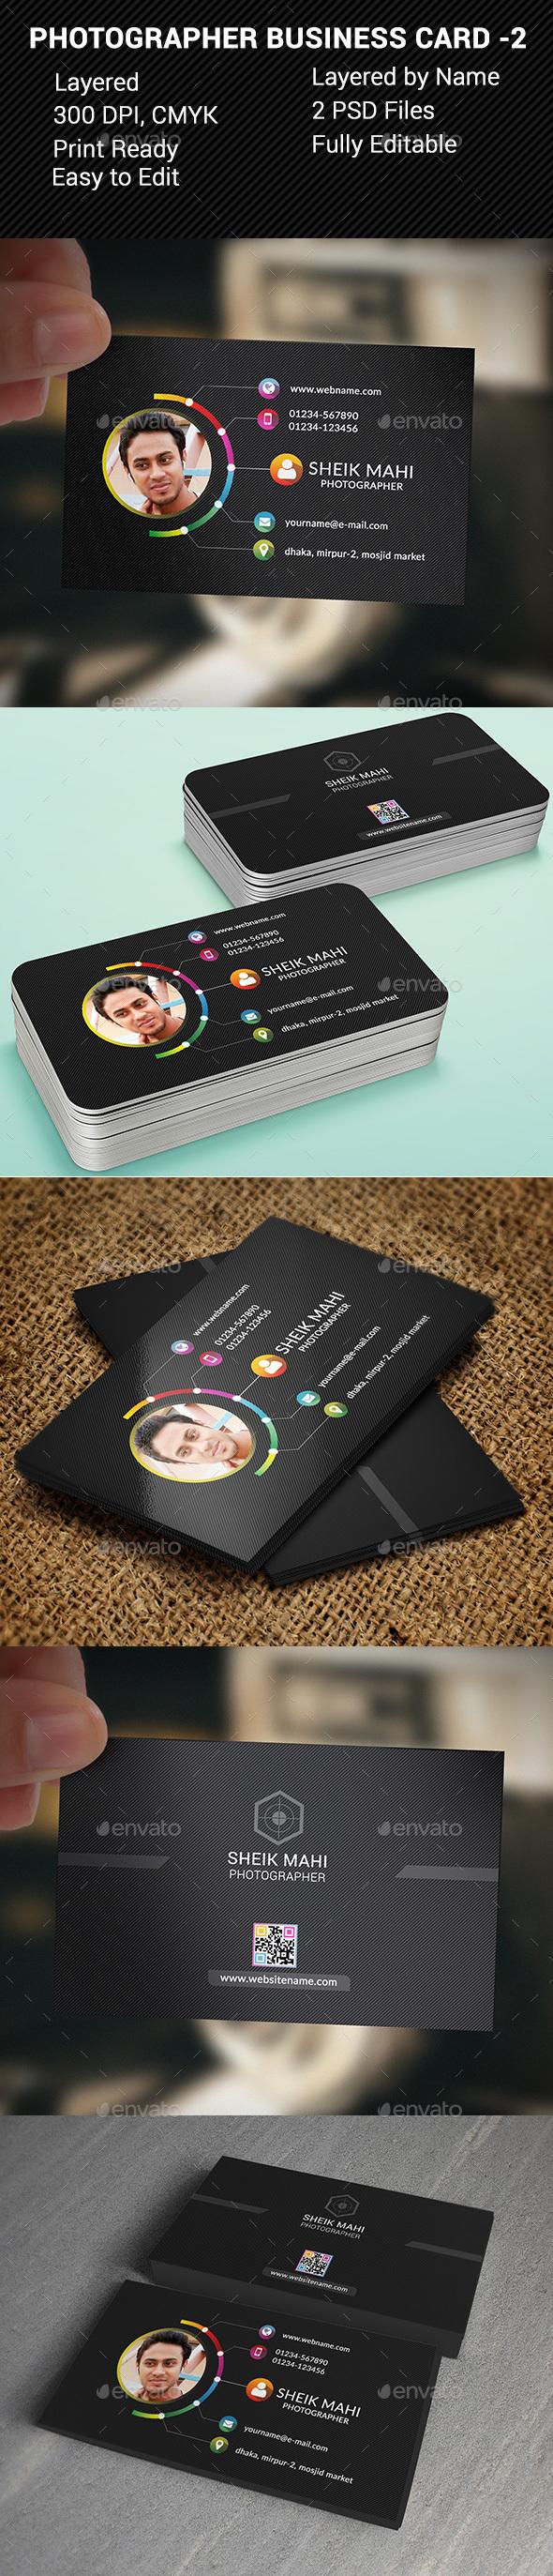 Photographer Business Card -2 - Business Cards Print Templates